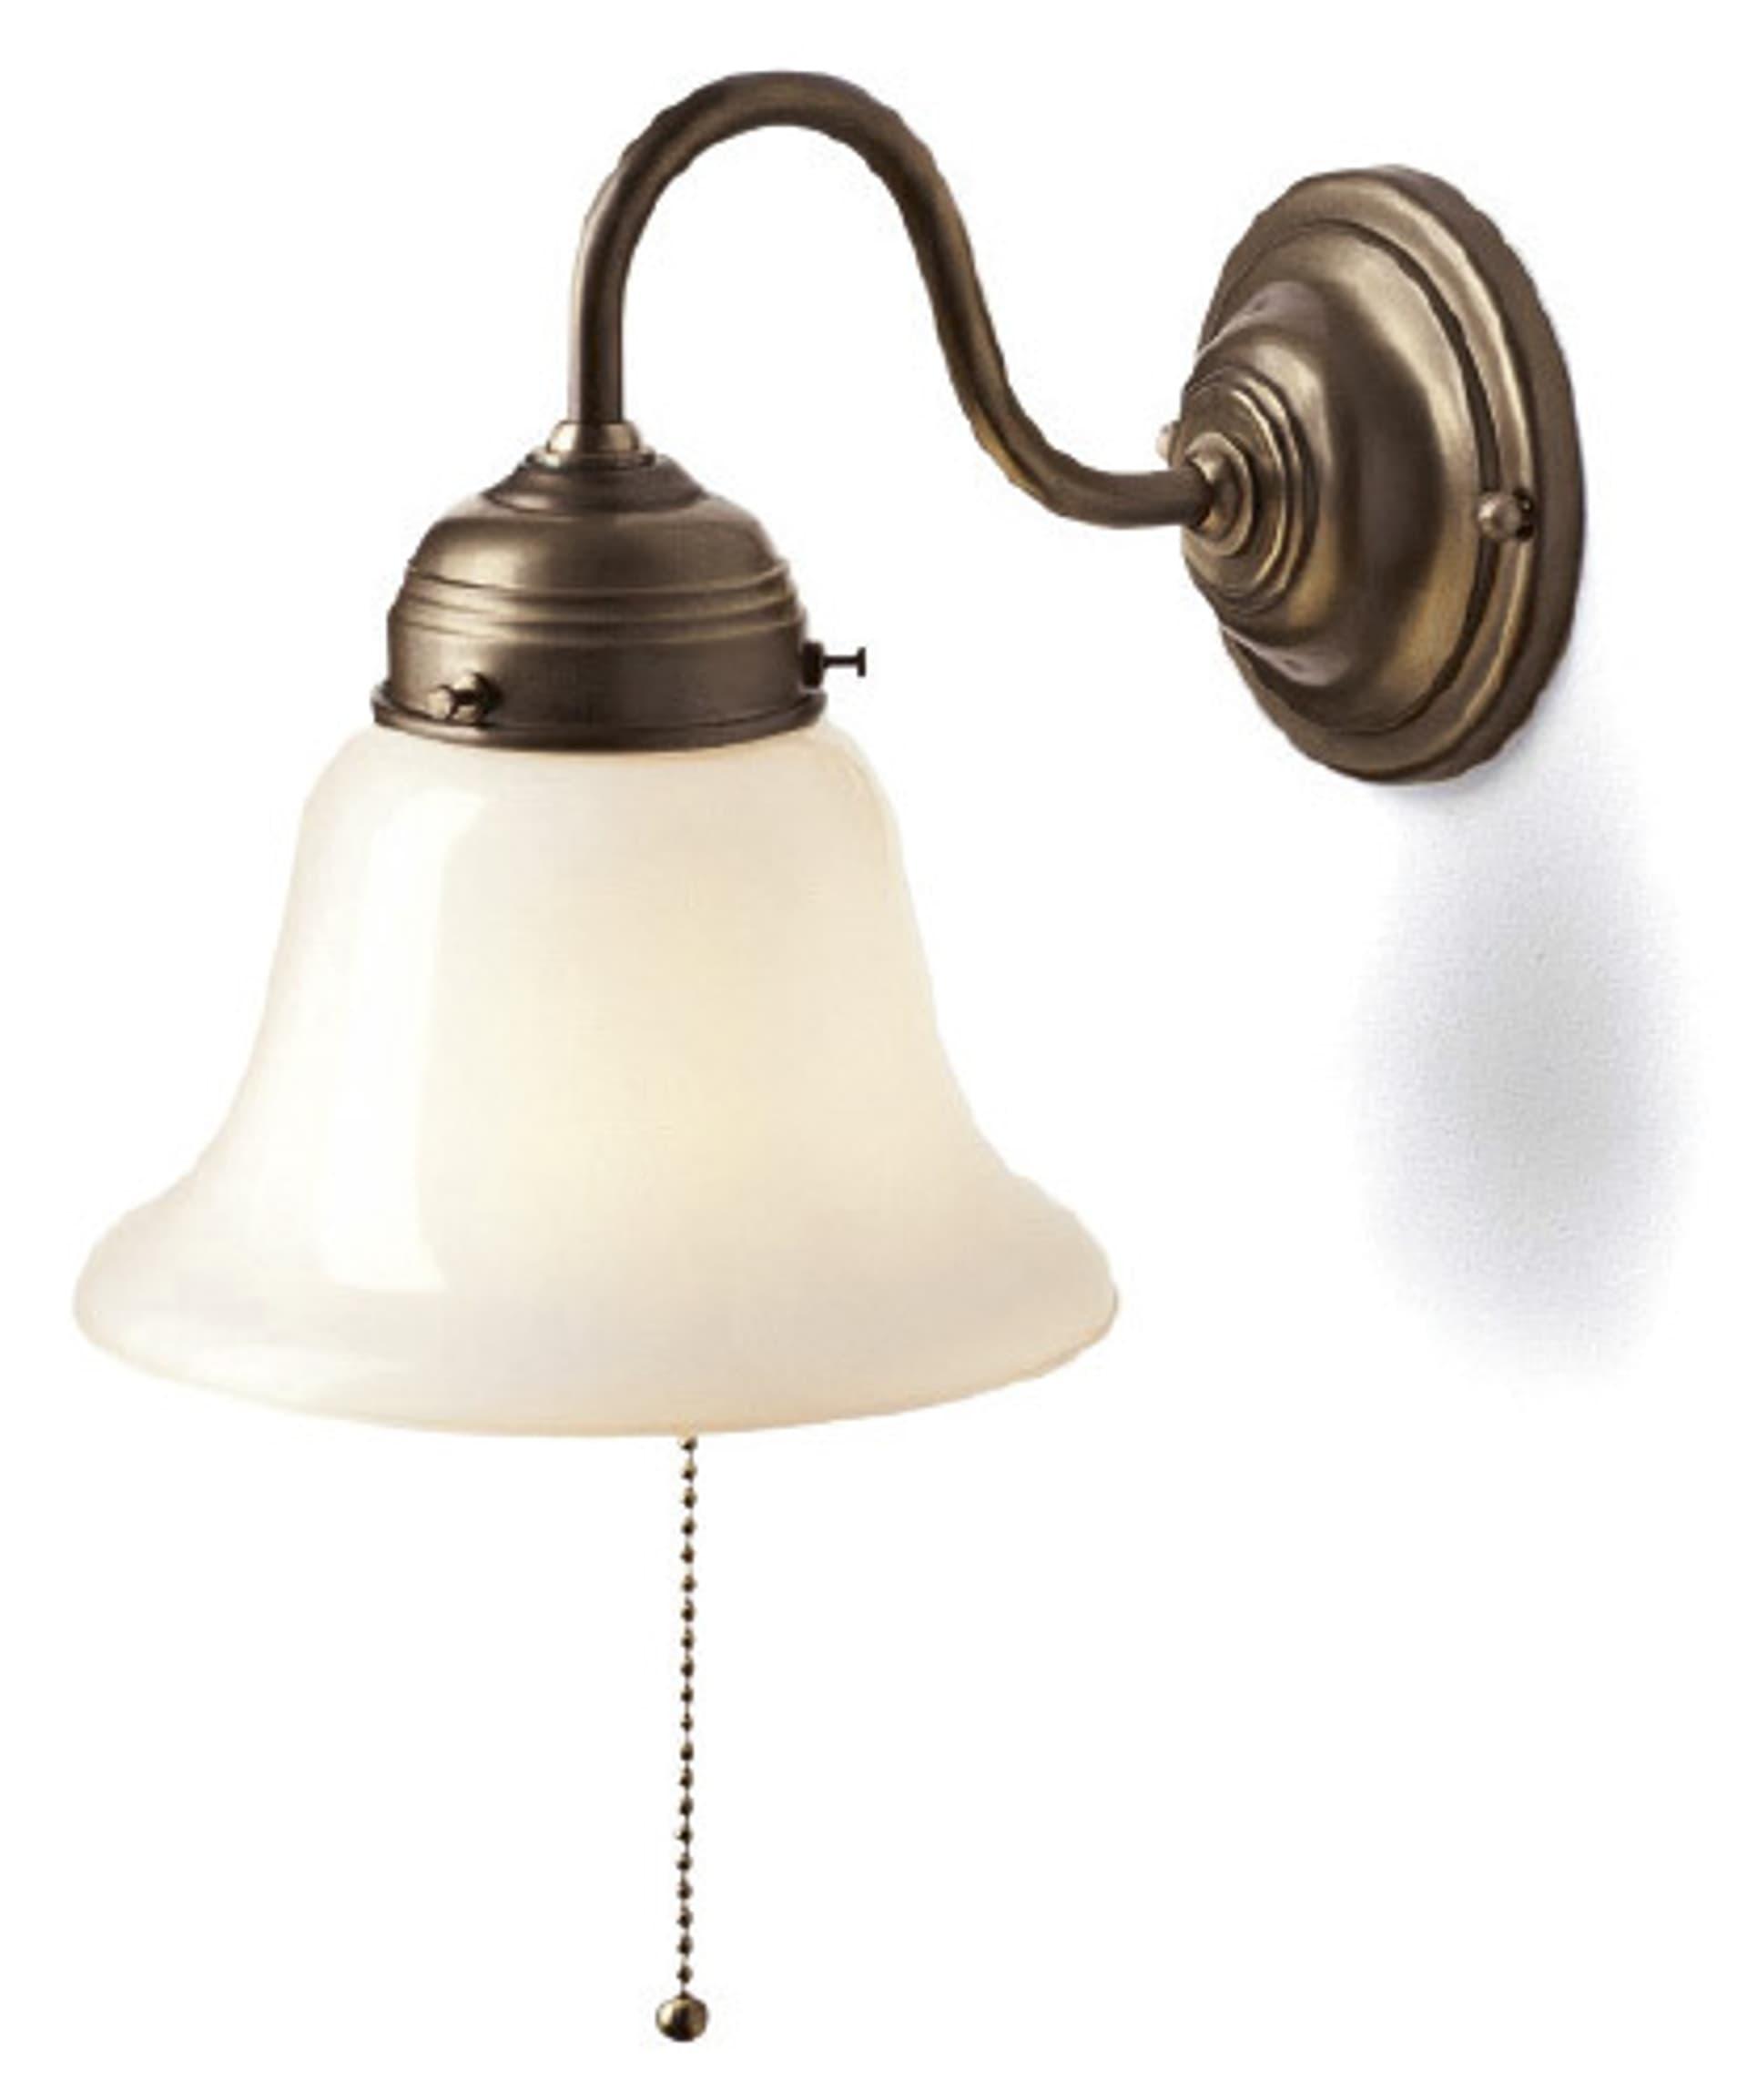 Wi berliner messing lampen